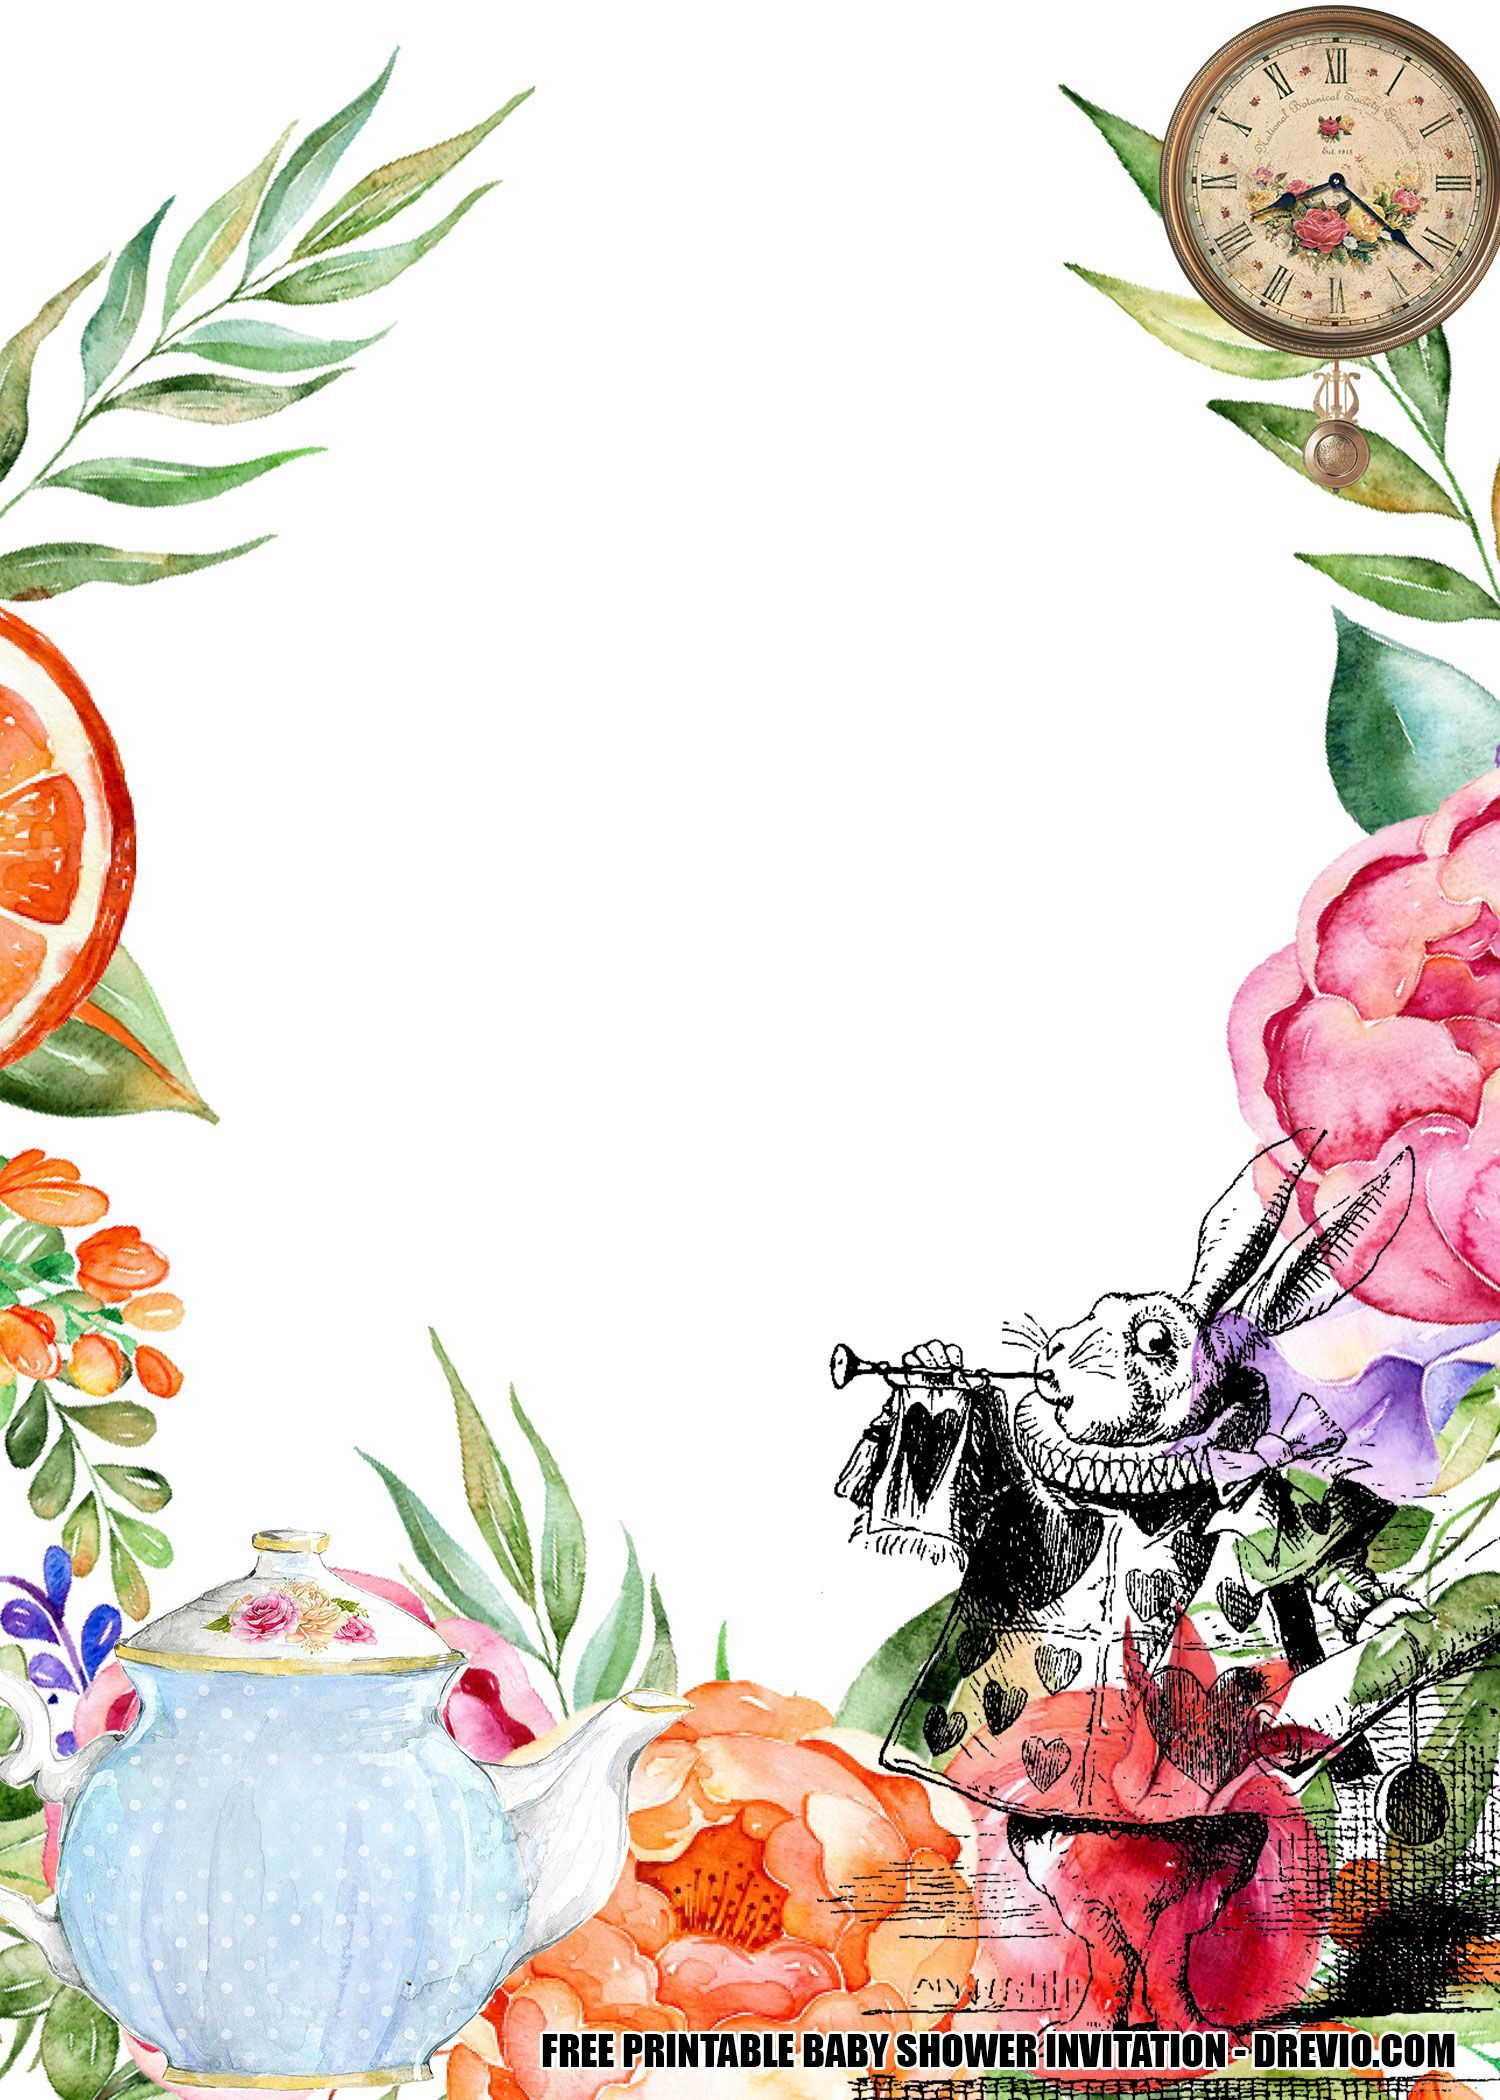 008 Frightening Alice In Wonderland Tea Party Template High Resolution  Templates Invitation FreeFull